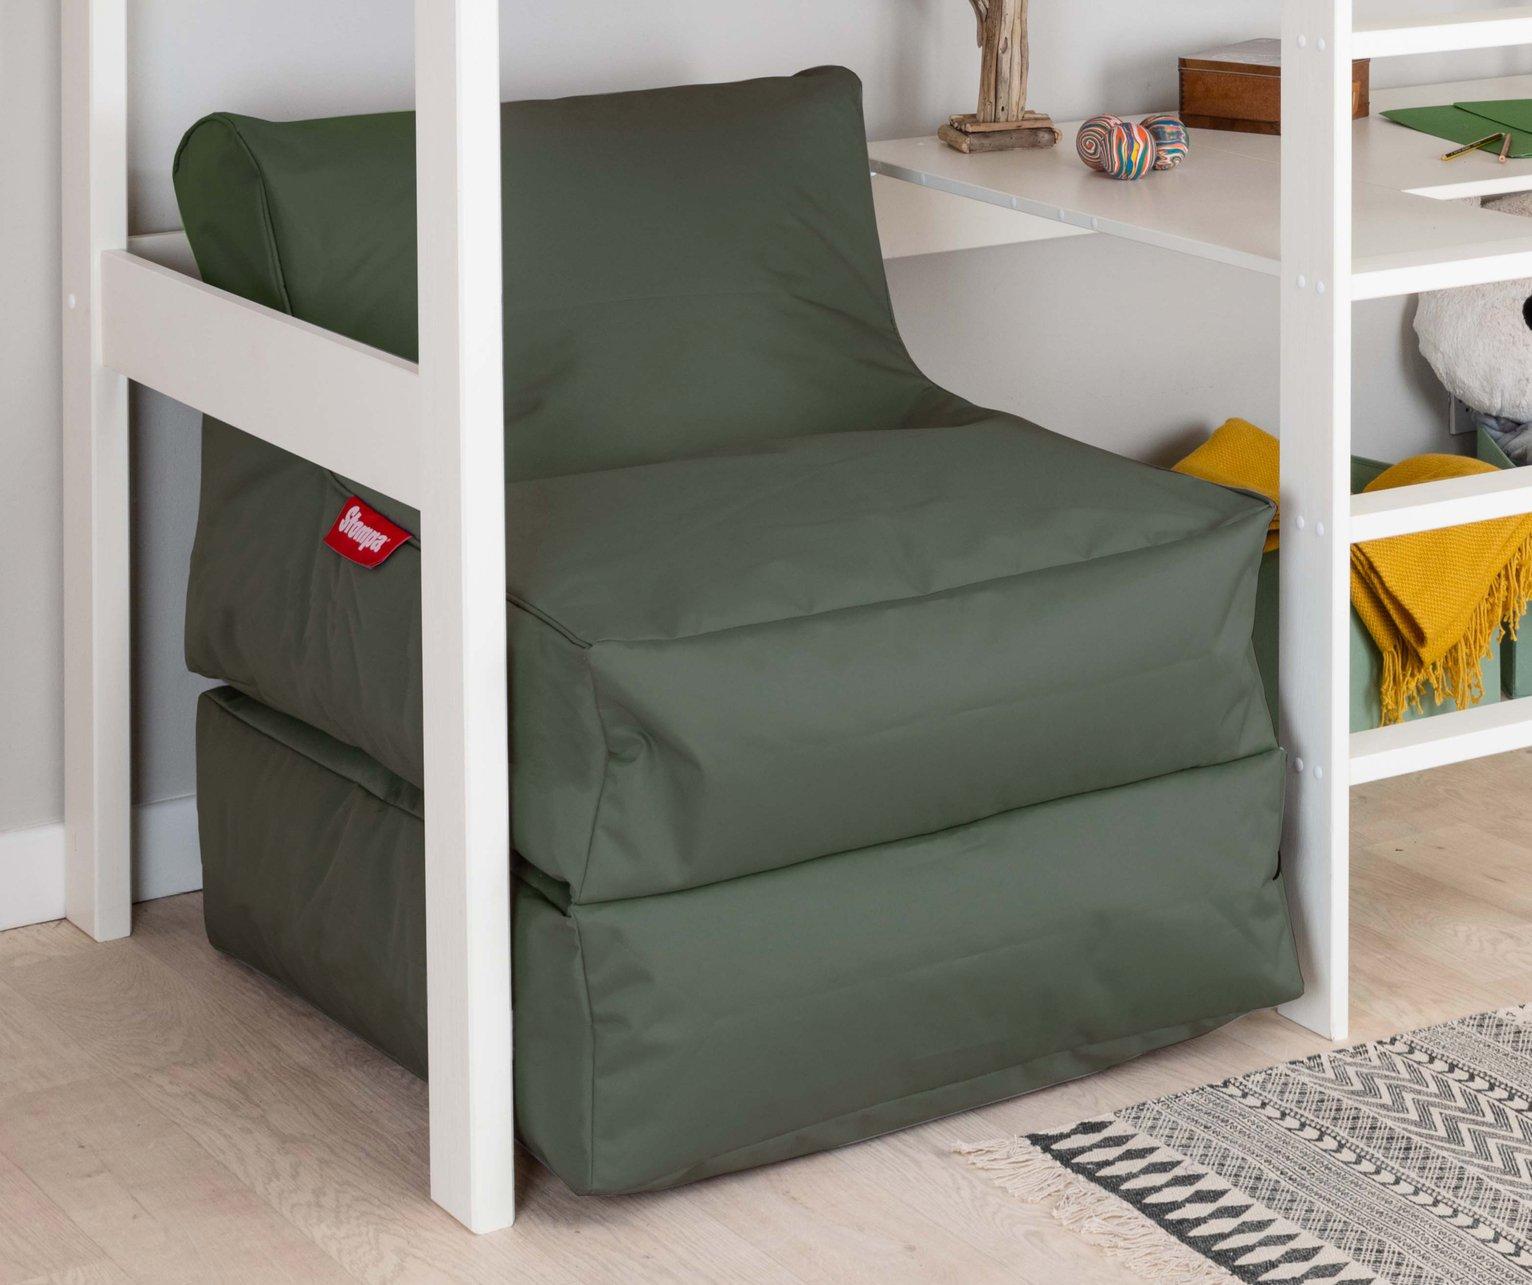 Stompa XL Flexi Sleep Lounger Beanbag - Khaki